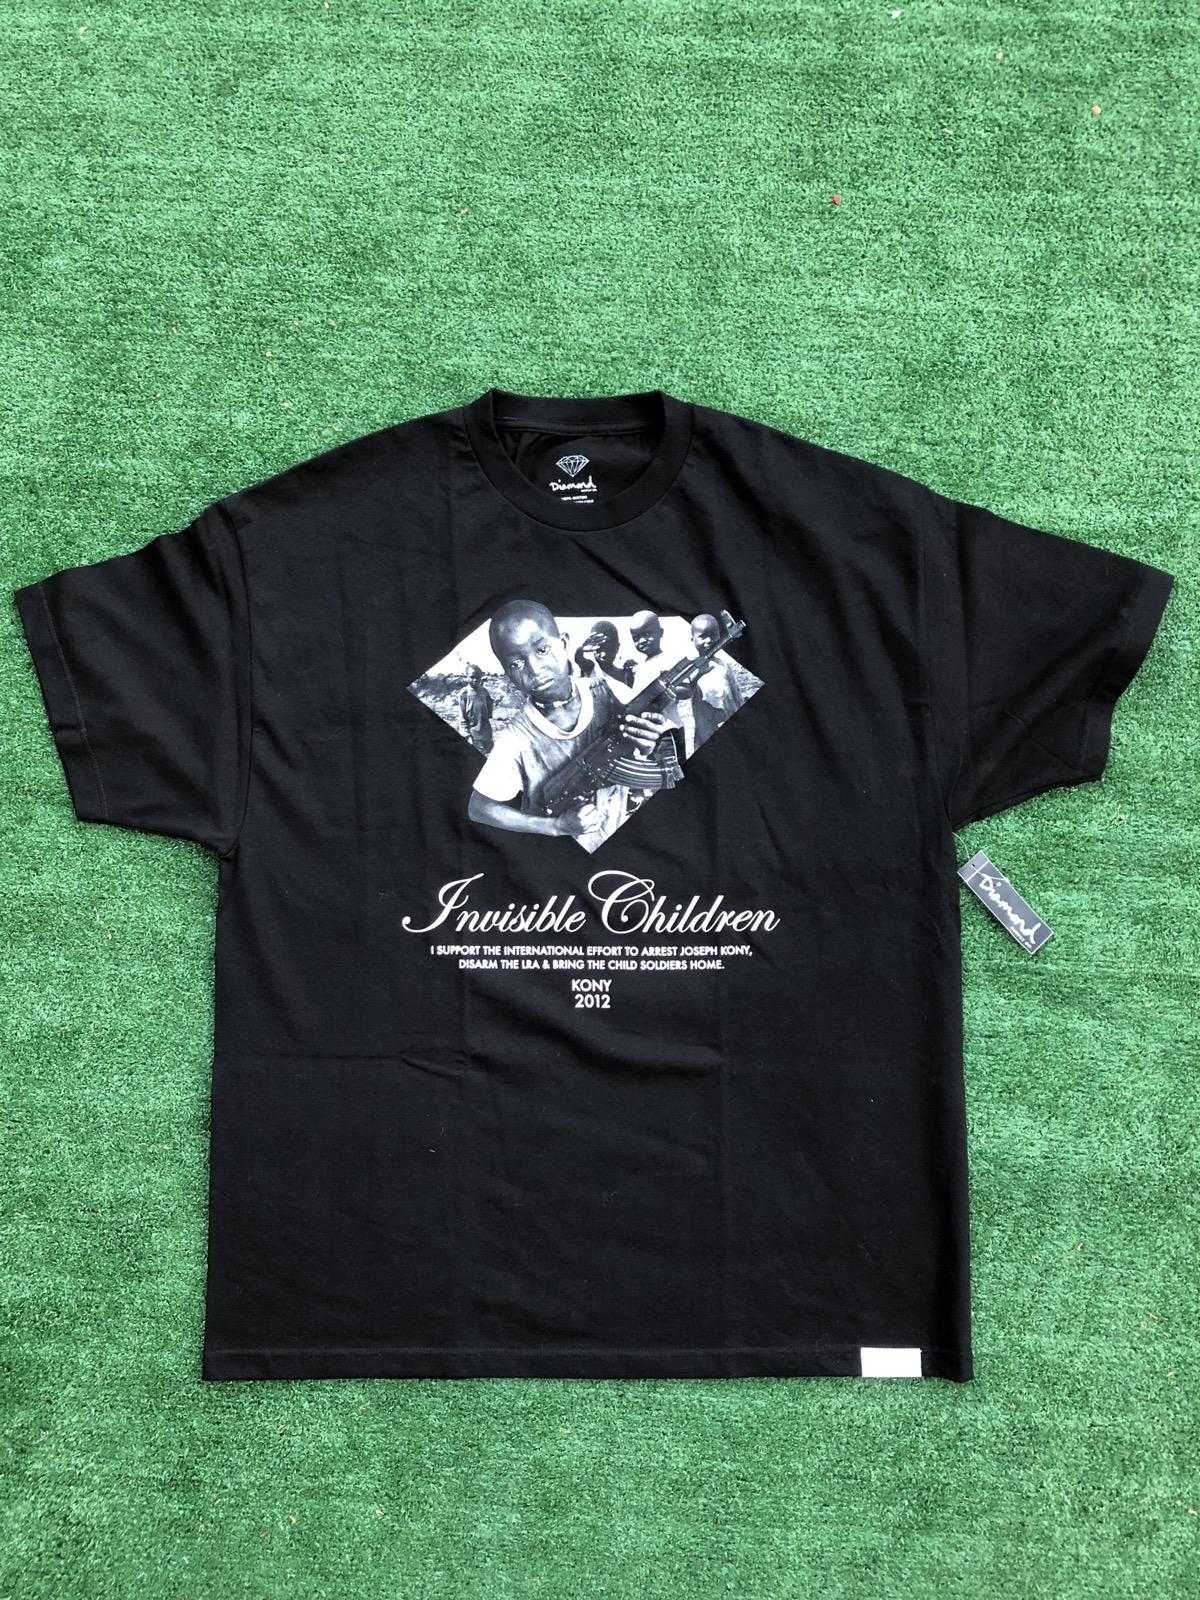 Diamond supply Kony 2012 shirt